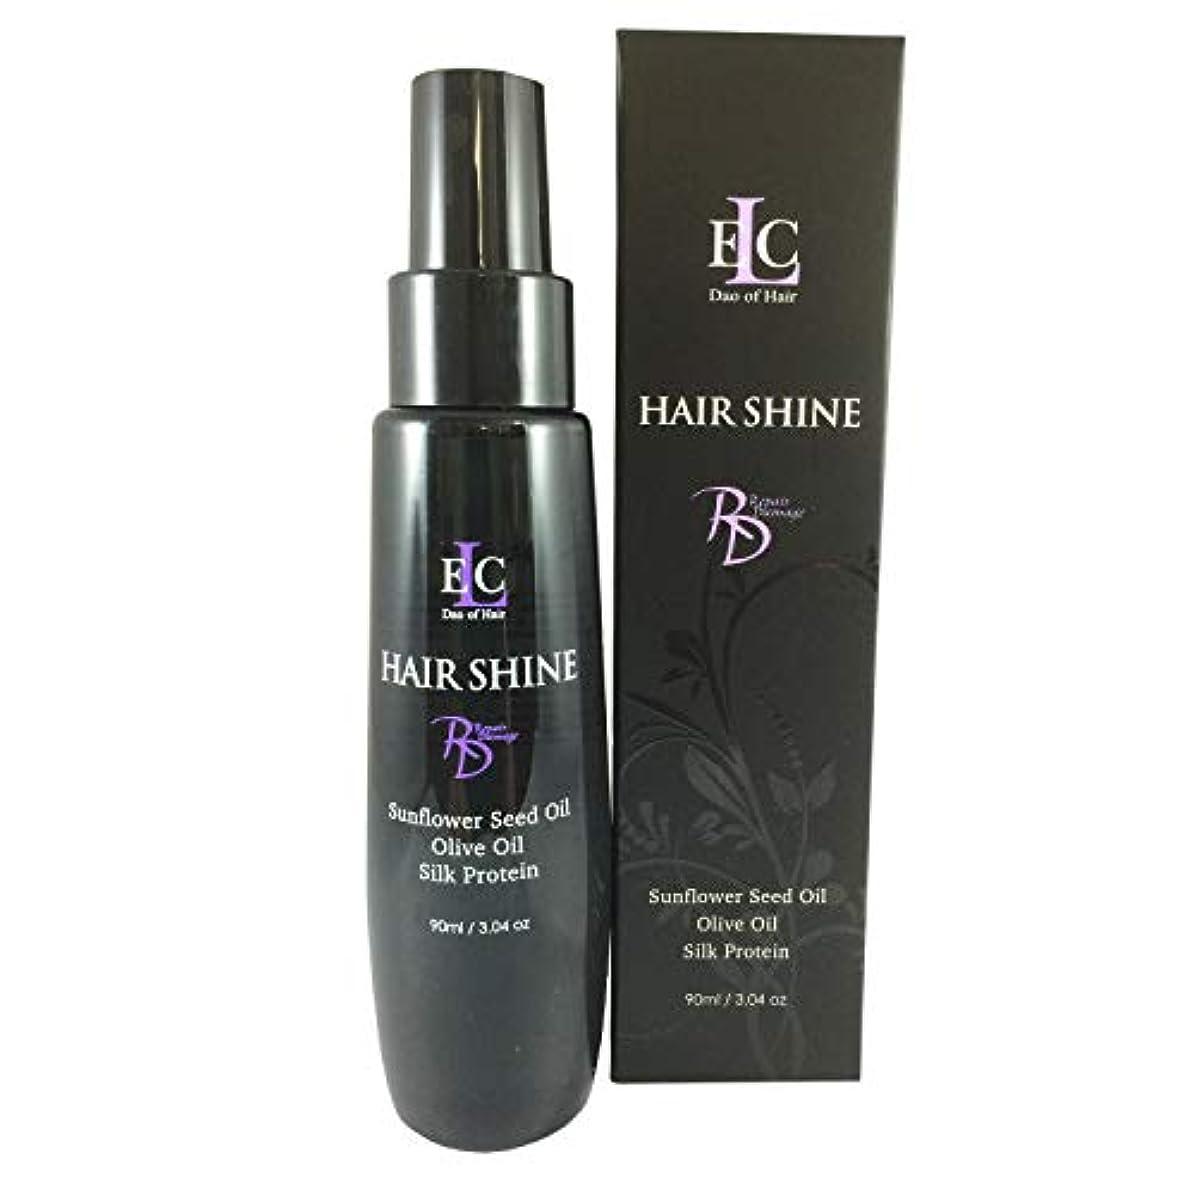 ELC Dao of Hair 修復ダメージヘアシャインスプレー - 3.04オンス